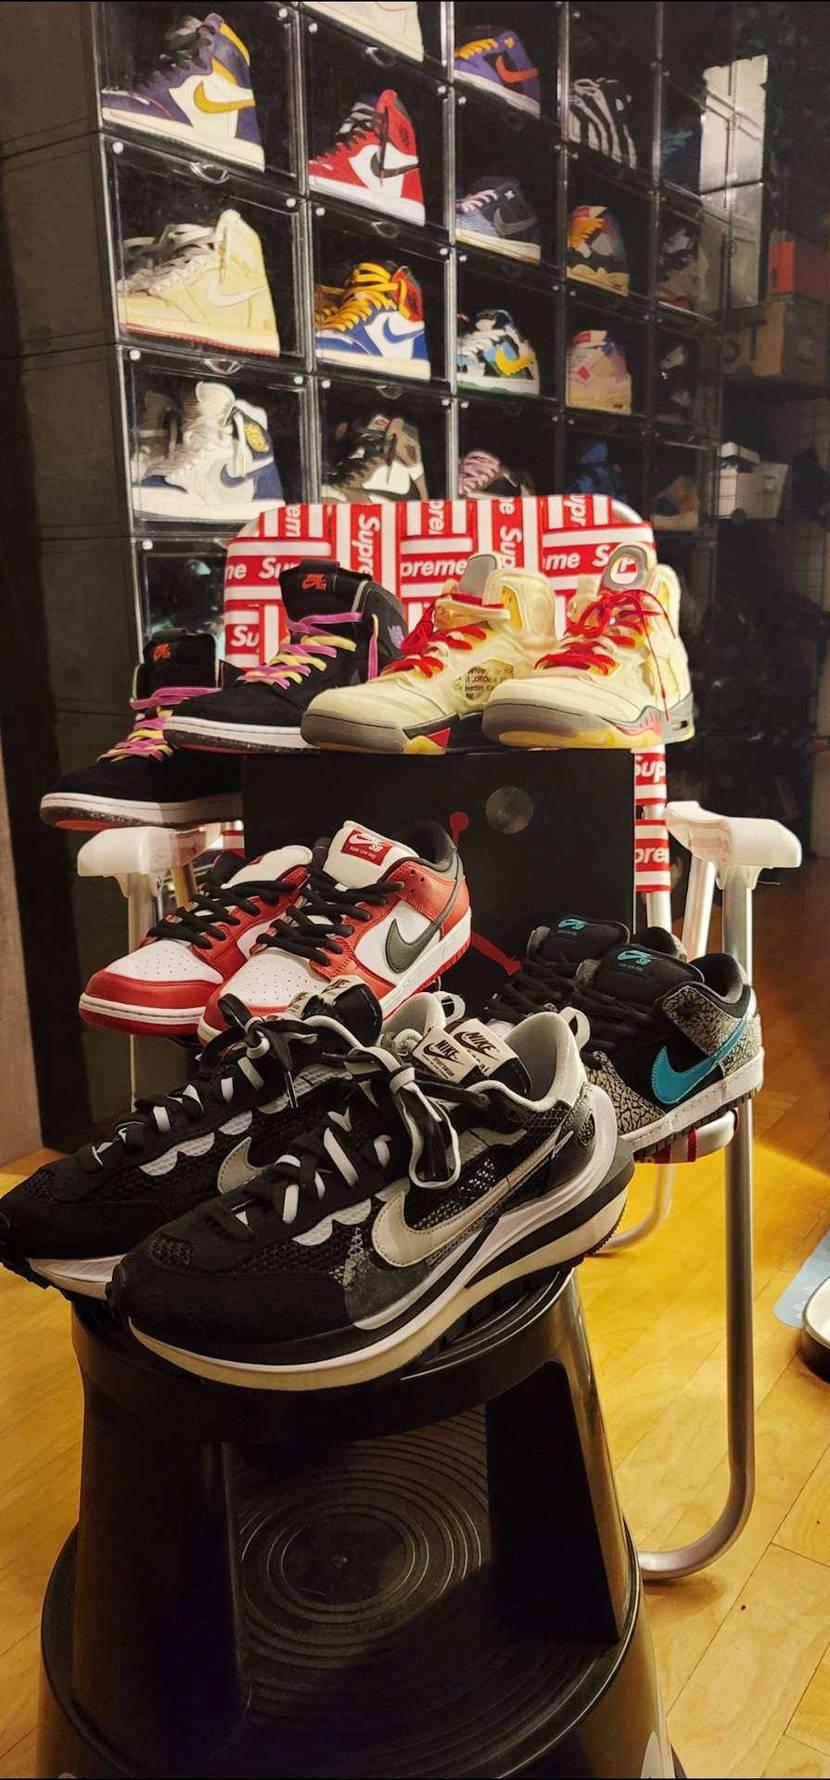 New sneakers for November どれもかっこいいっすな~ A